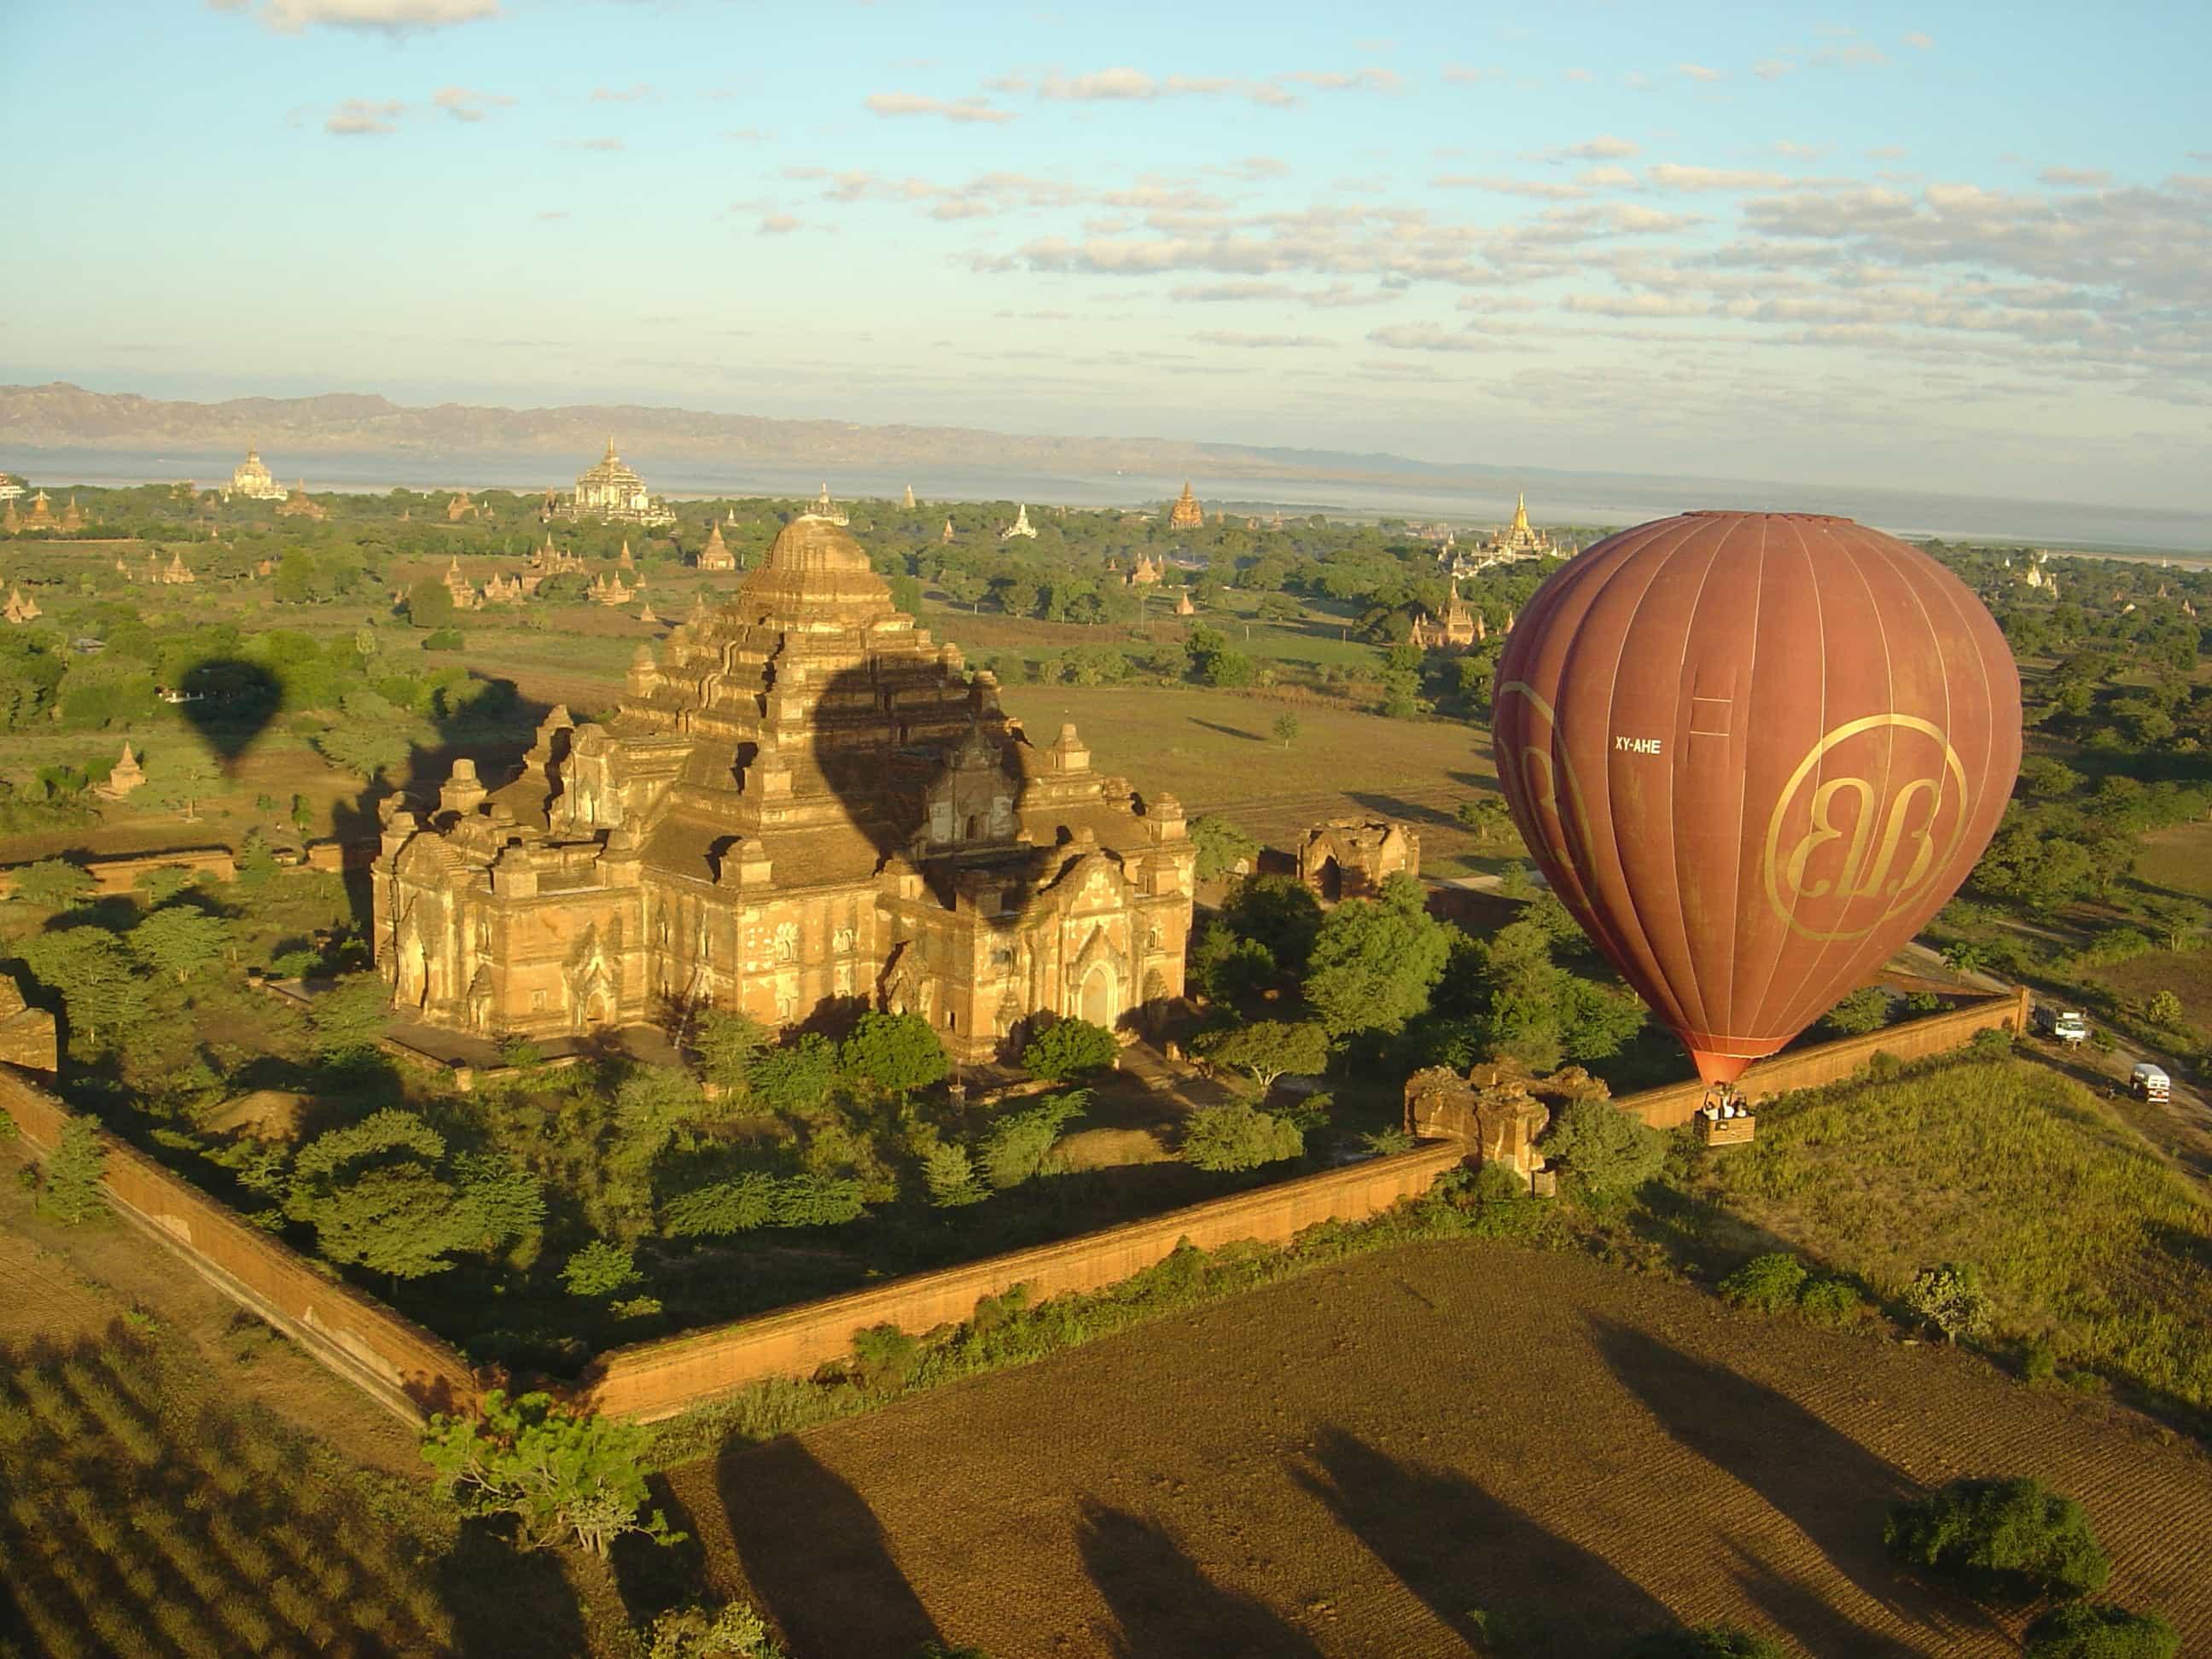 Angkor Wat Hot Air Balloon Experience in Siem Reap